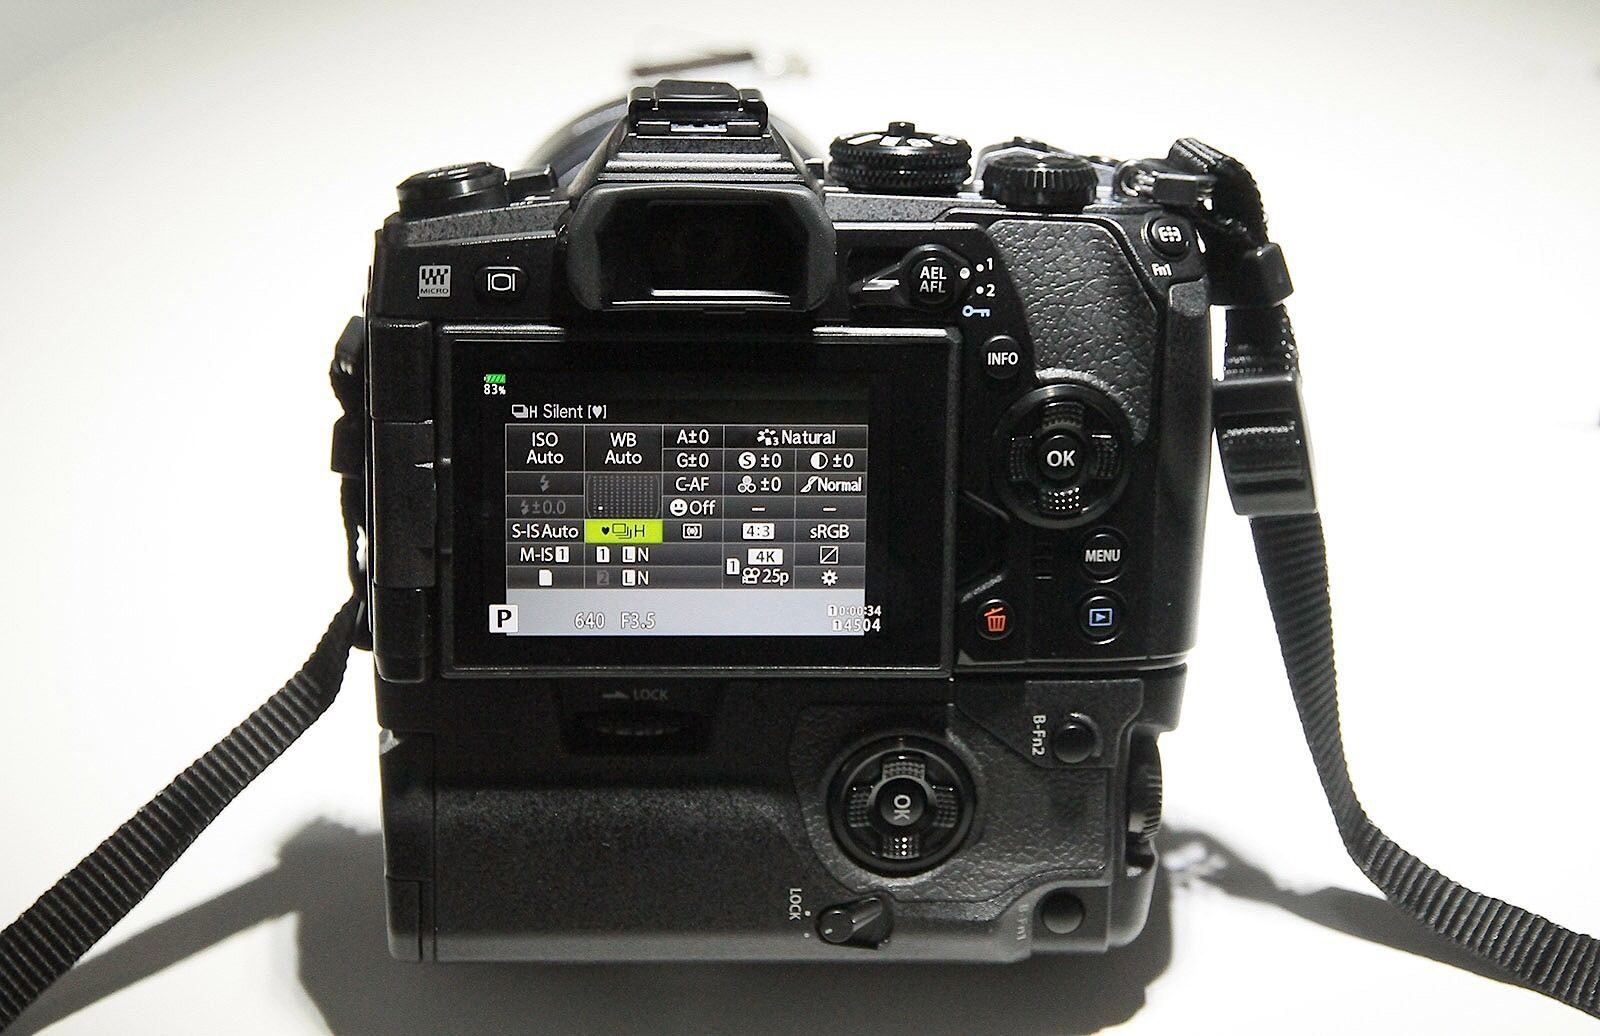 First Look At The Olympus Omd Em1 Mark Ii Mirrorless Camera Camera